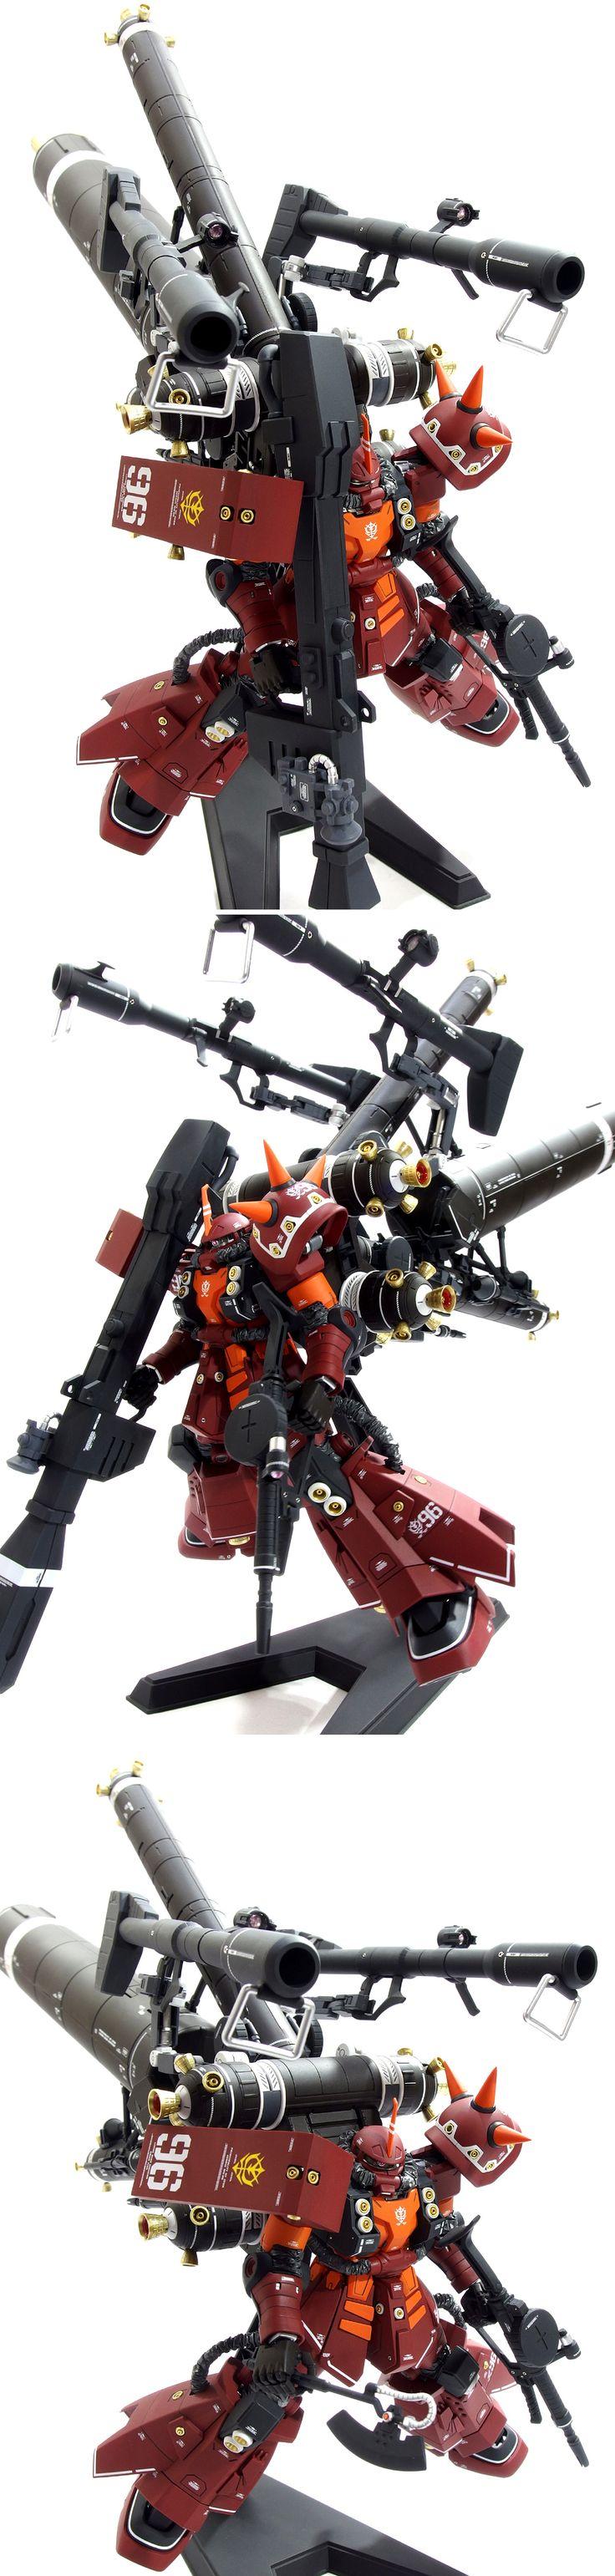 1/100 MG 高機動型ザク サイコ・ザクVer.Ka 塗装済完成品 - ヤフオク!